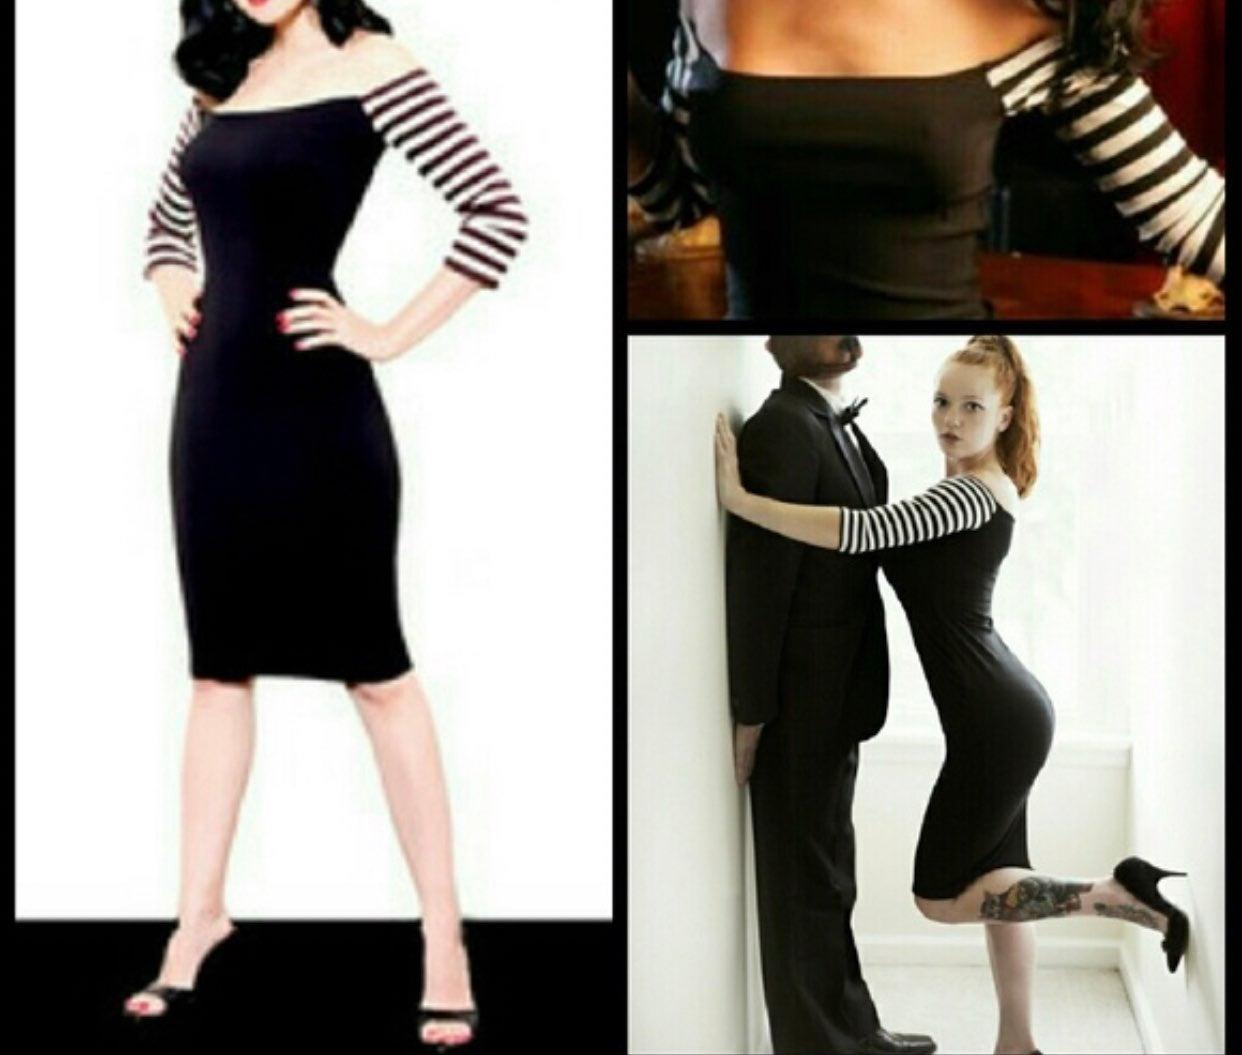 Mode Merr XXL Sleeve striped dress